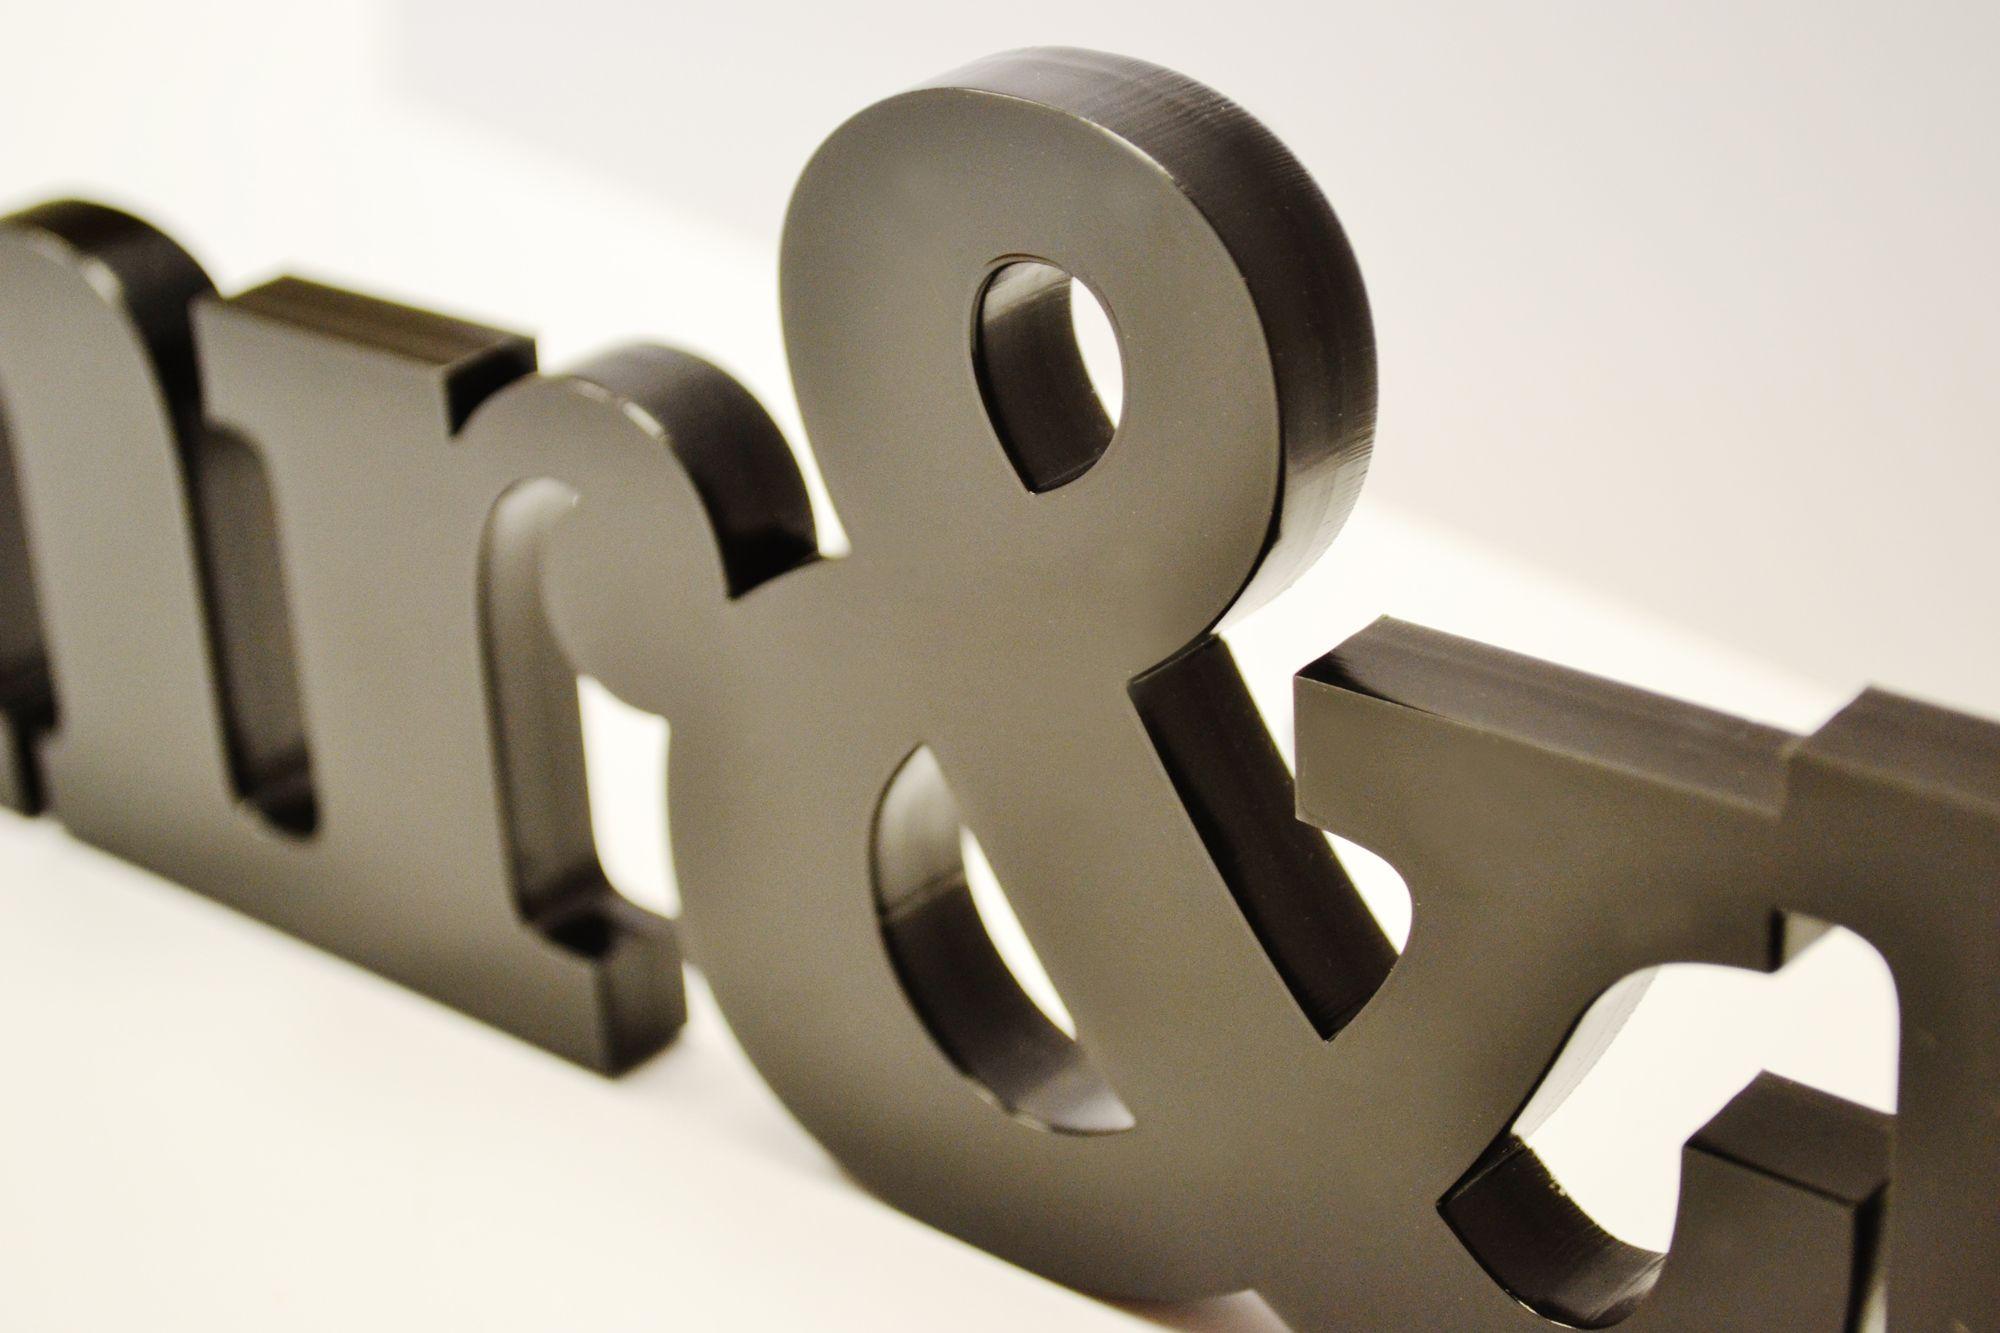 Cut Metal Letters Bradfordlasercutting_Nonmetalletters  Signage  Pinterest